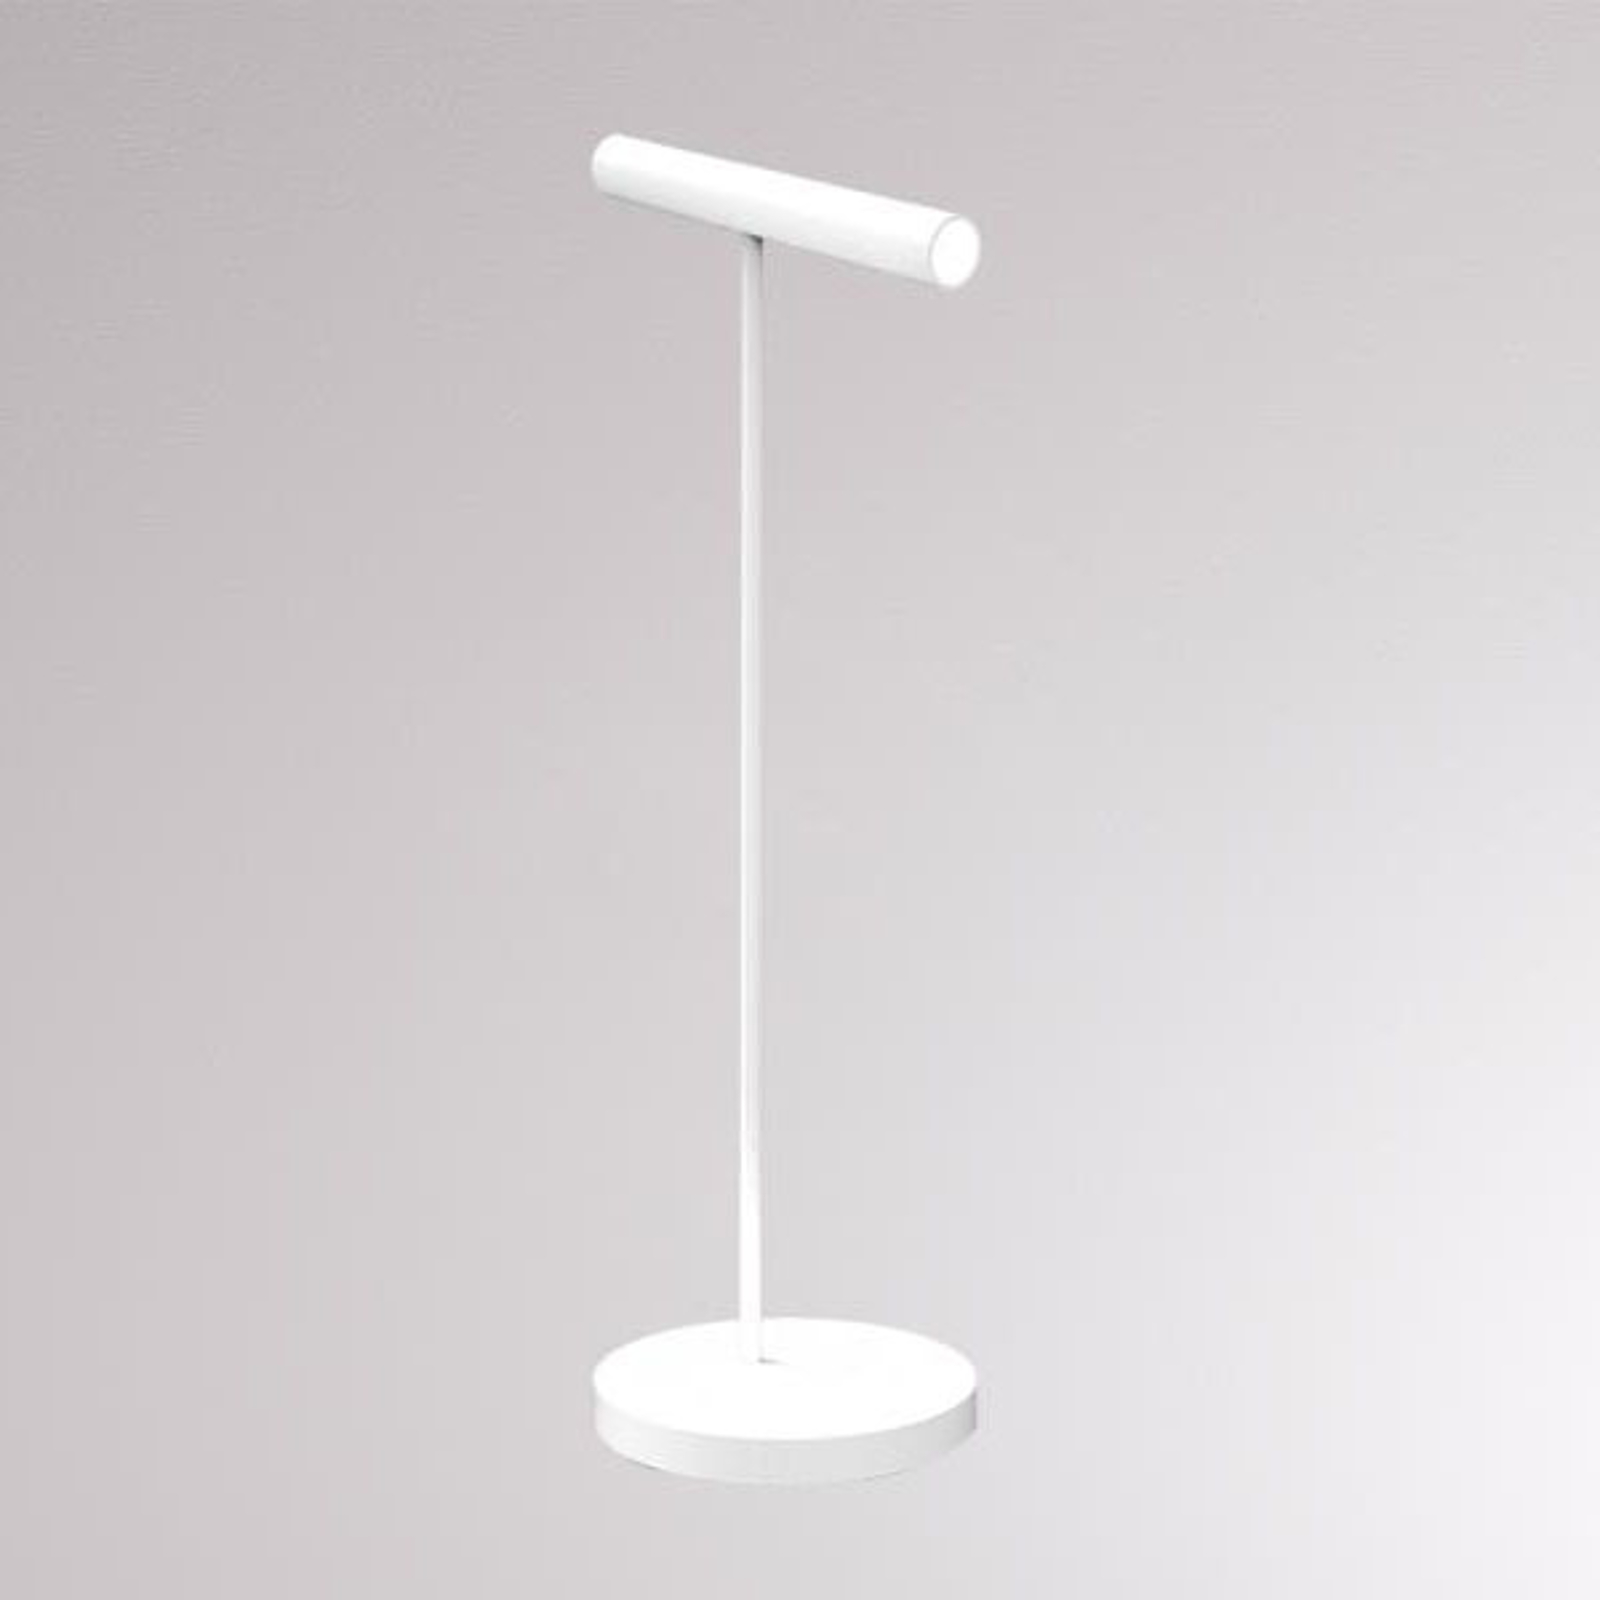 LOUM Meyjo lampe à poser LED blanche